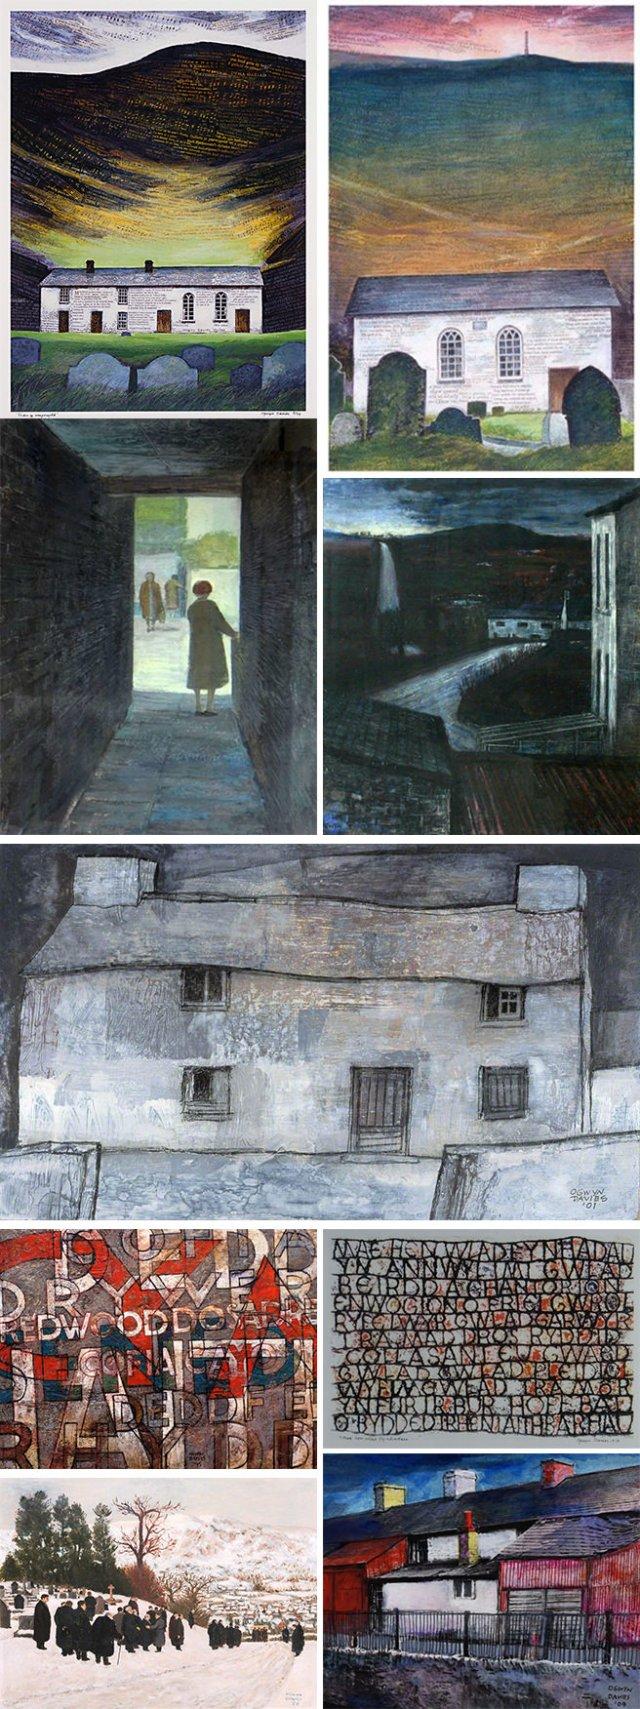 Montage of Ogwyn Davies artworks